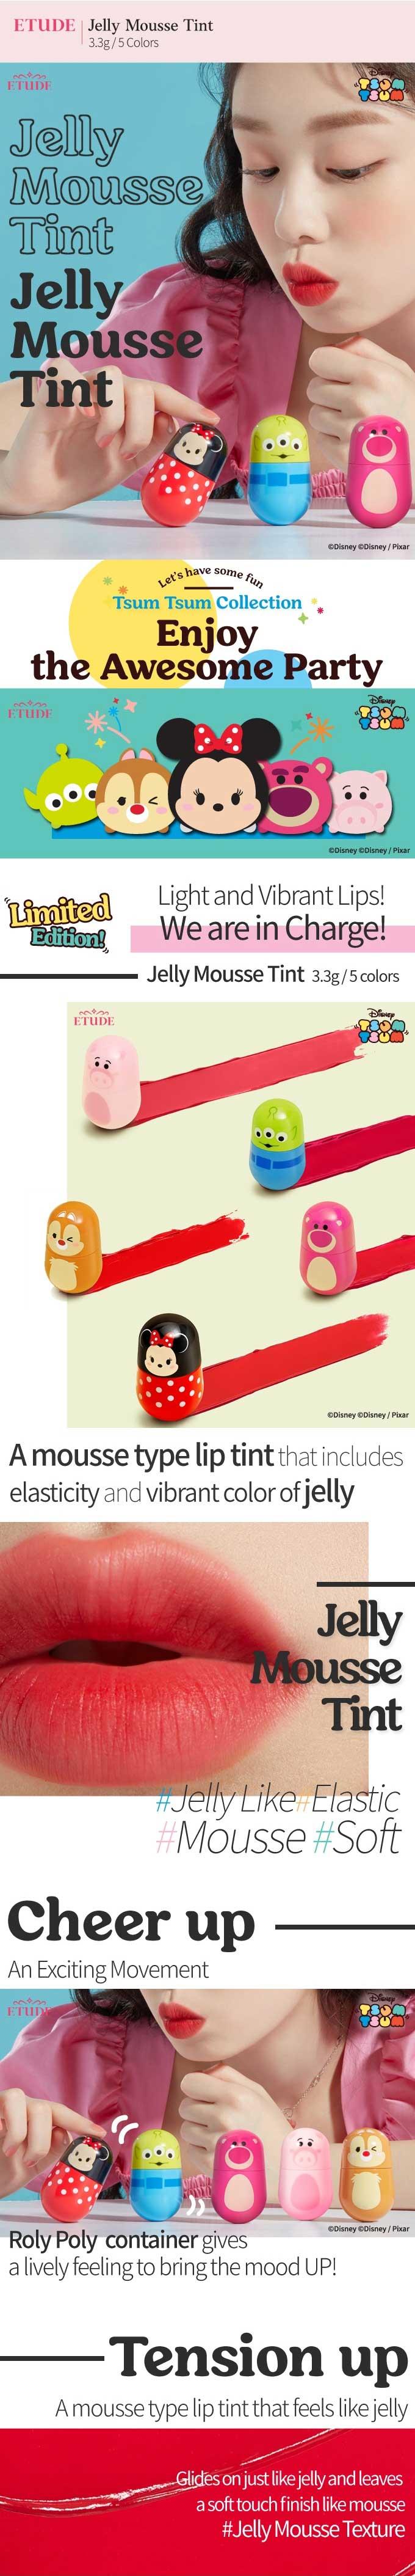 jelly-mousse-tint-3.3g-etude-house-x-disney-tsum-tsum-1.jpg